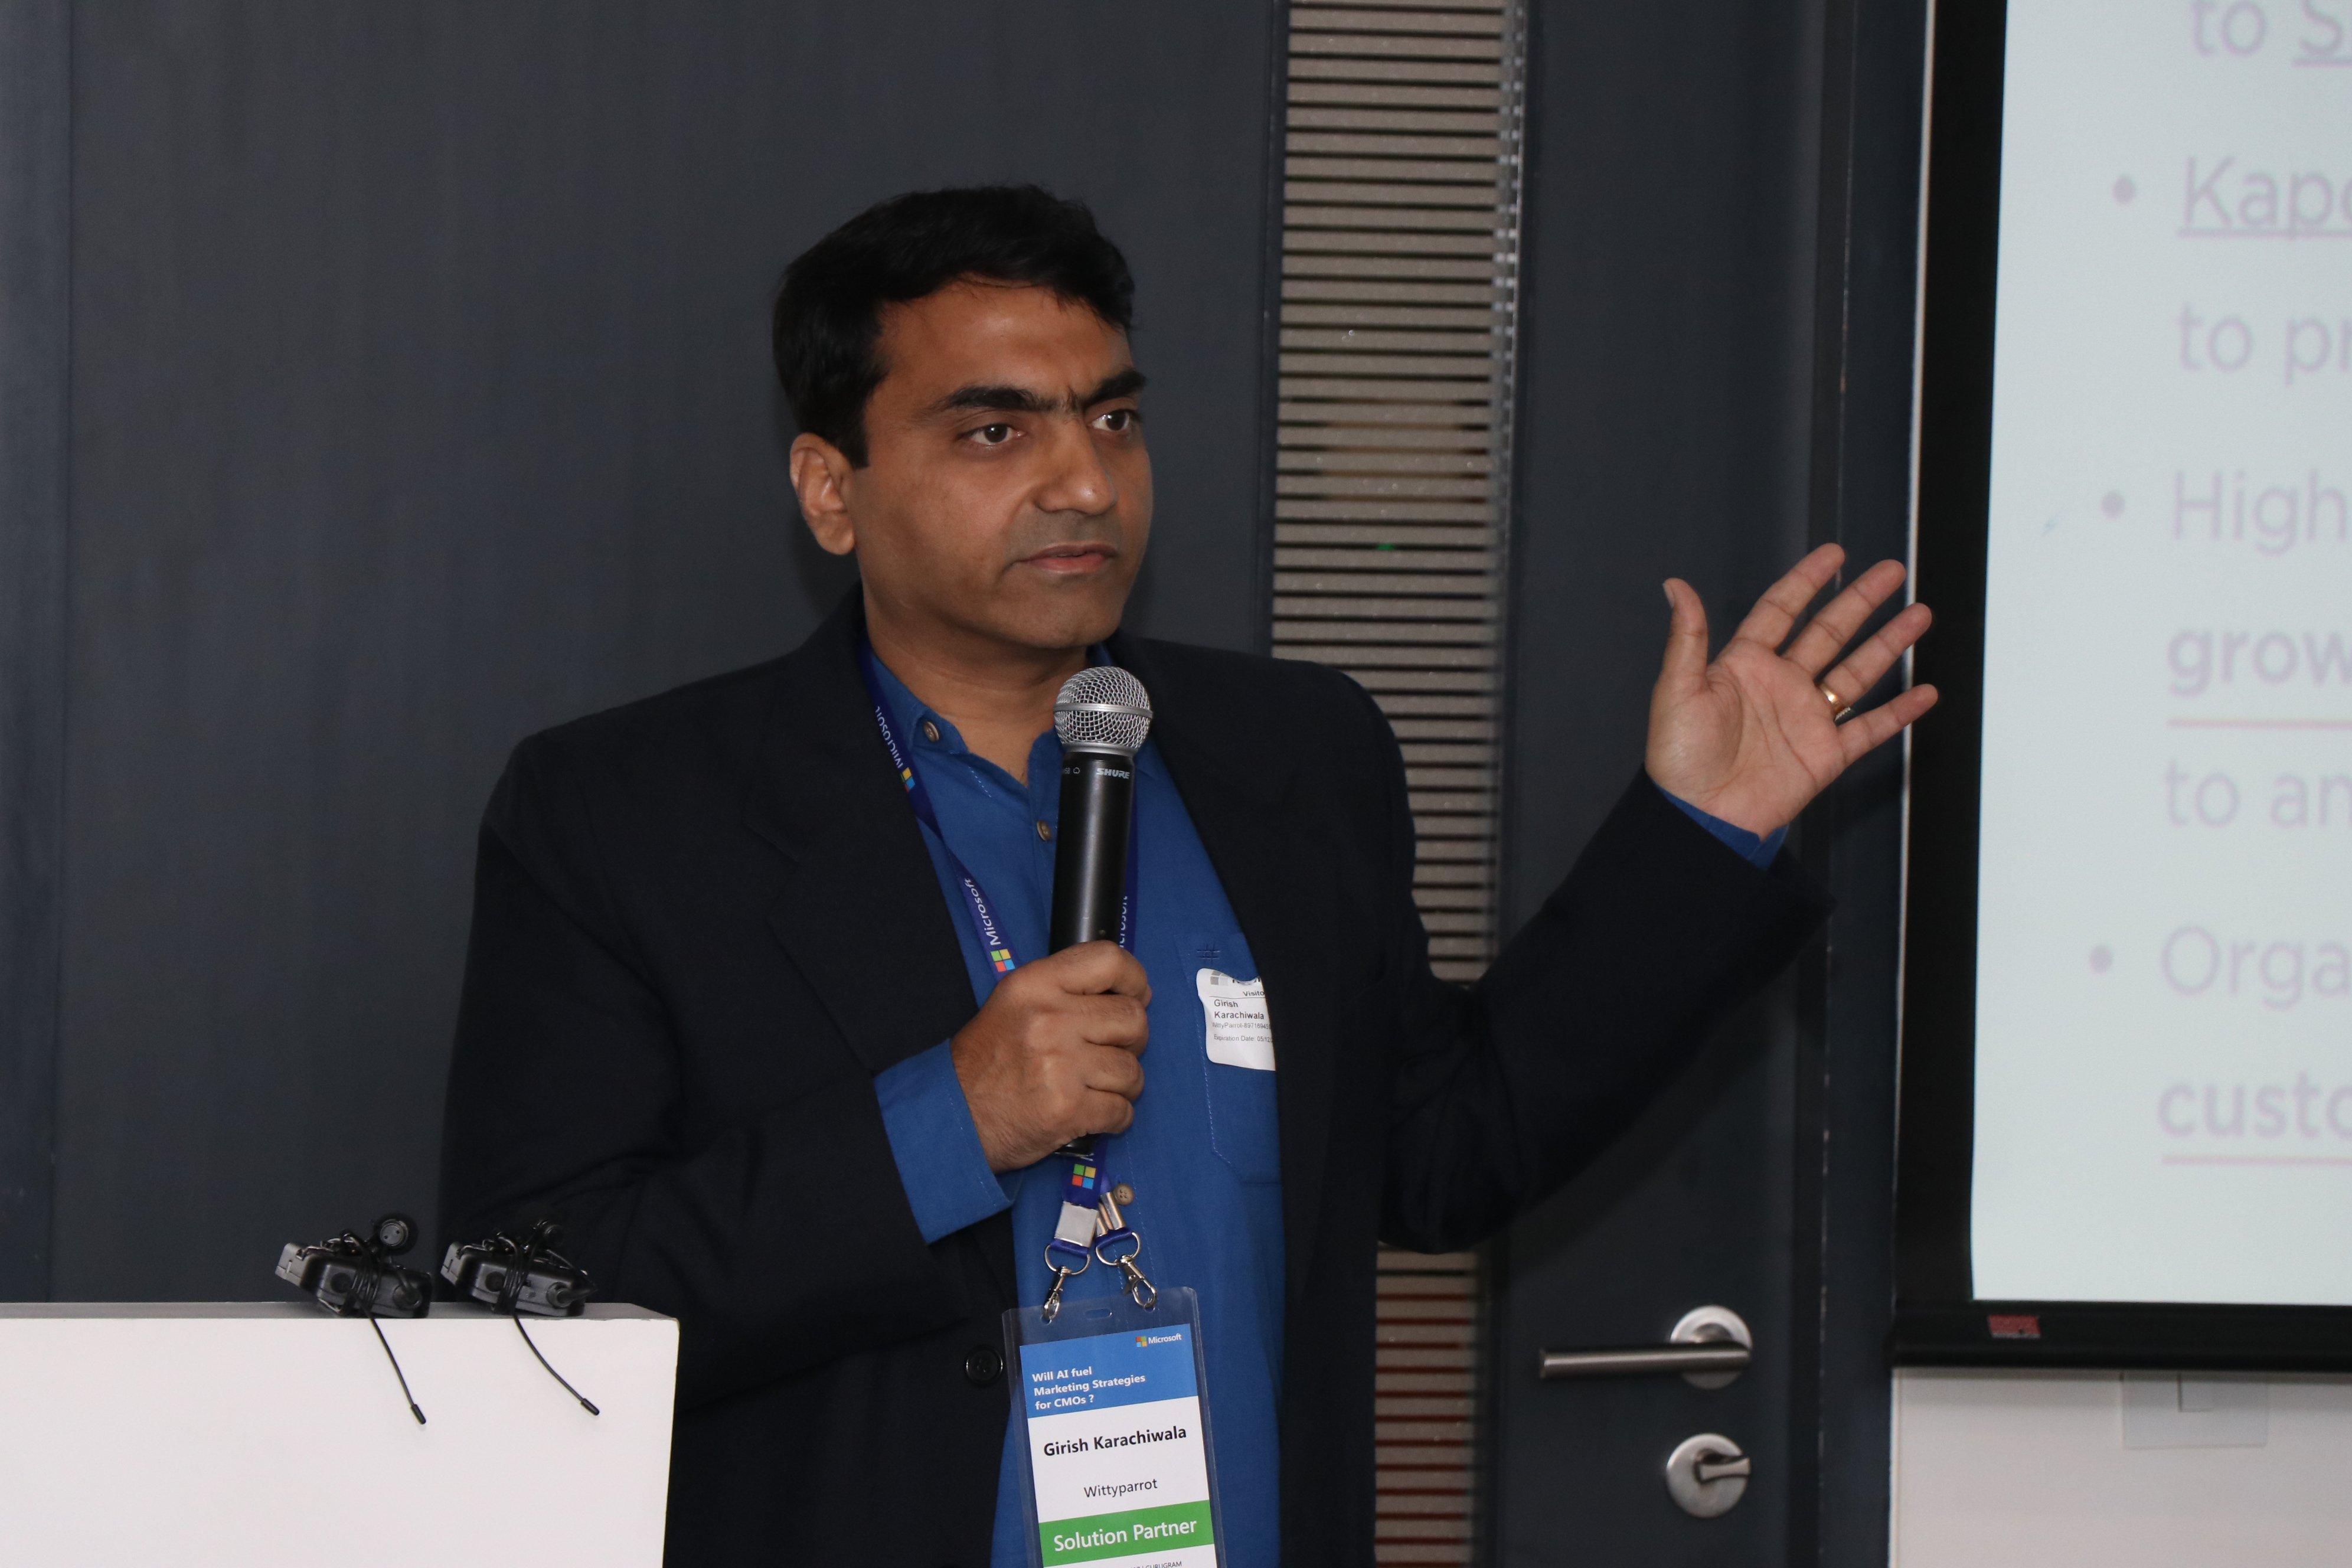 Microsoft Workshop: Girish Karachiwala, CTO, WittyParrot